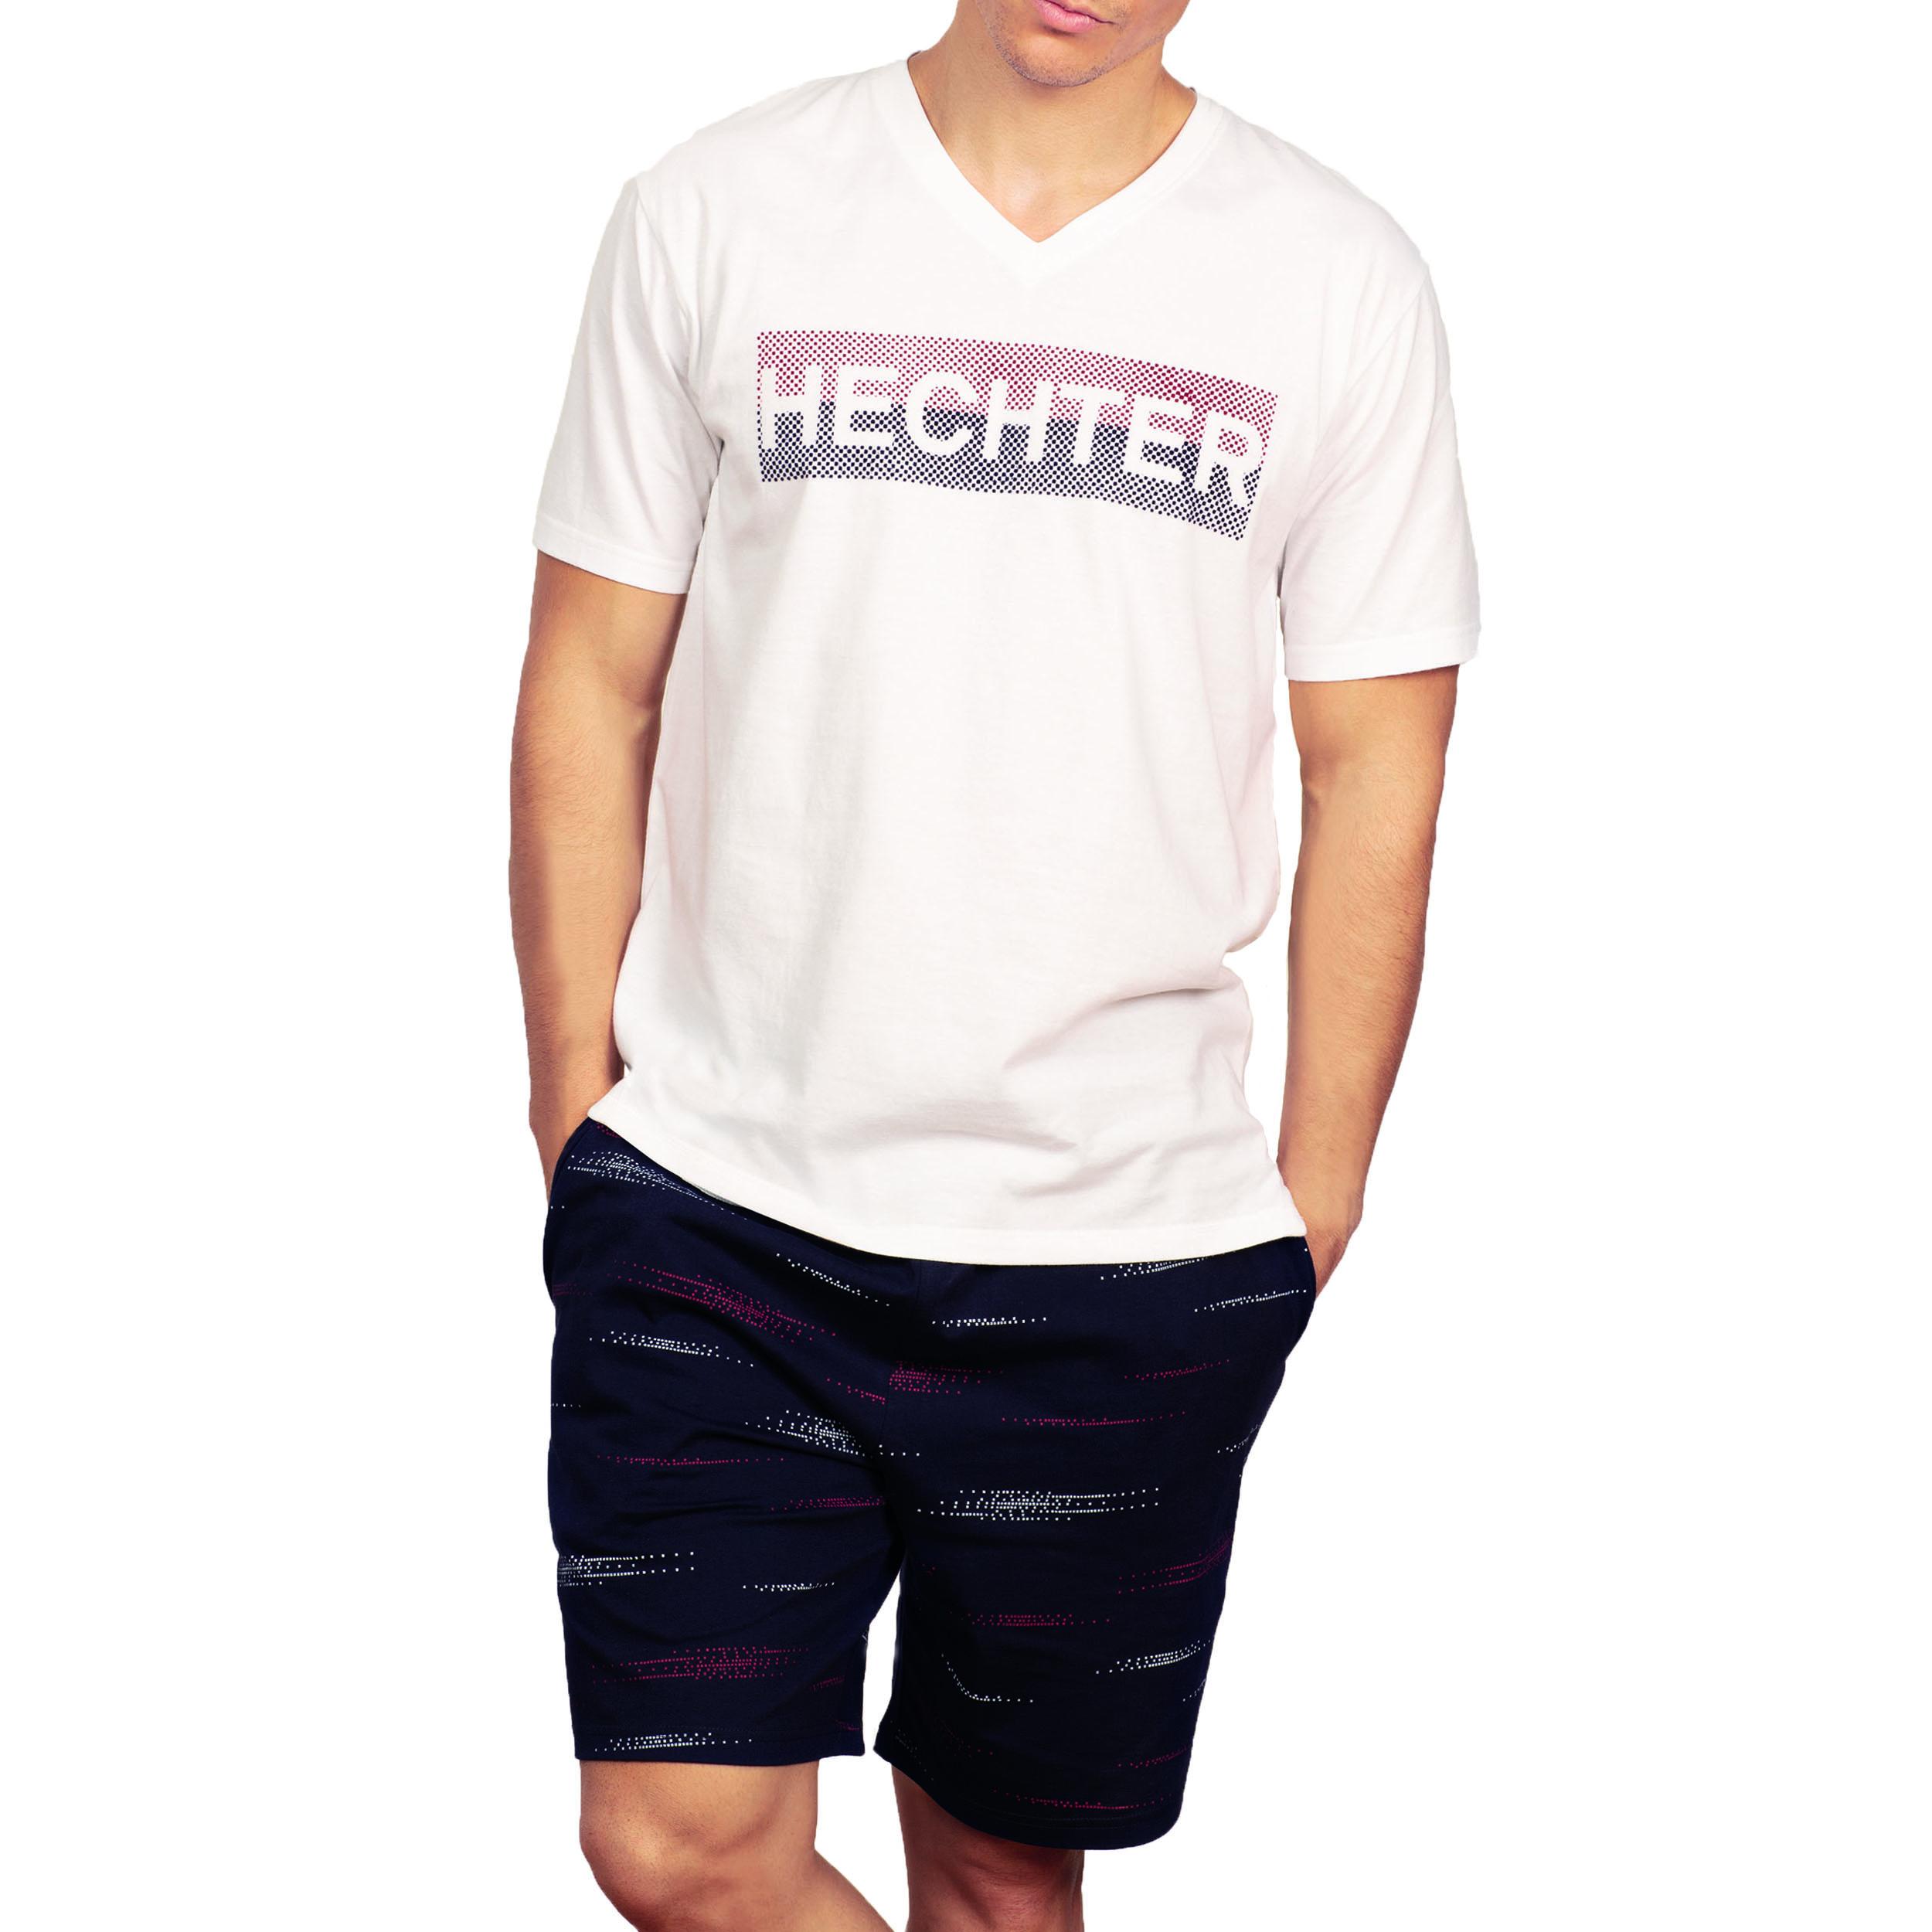 Pyjama court Hechter Studio en coton : tee-shirt col V blanc et short bleu marine floqué